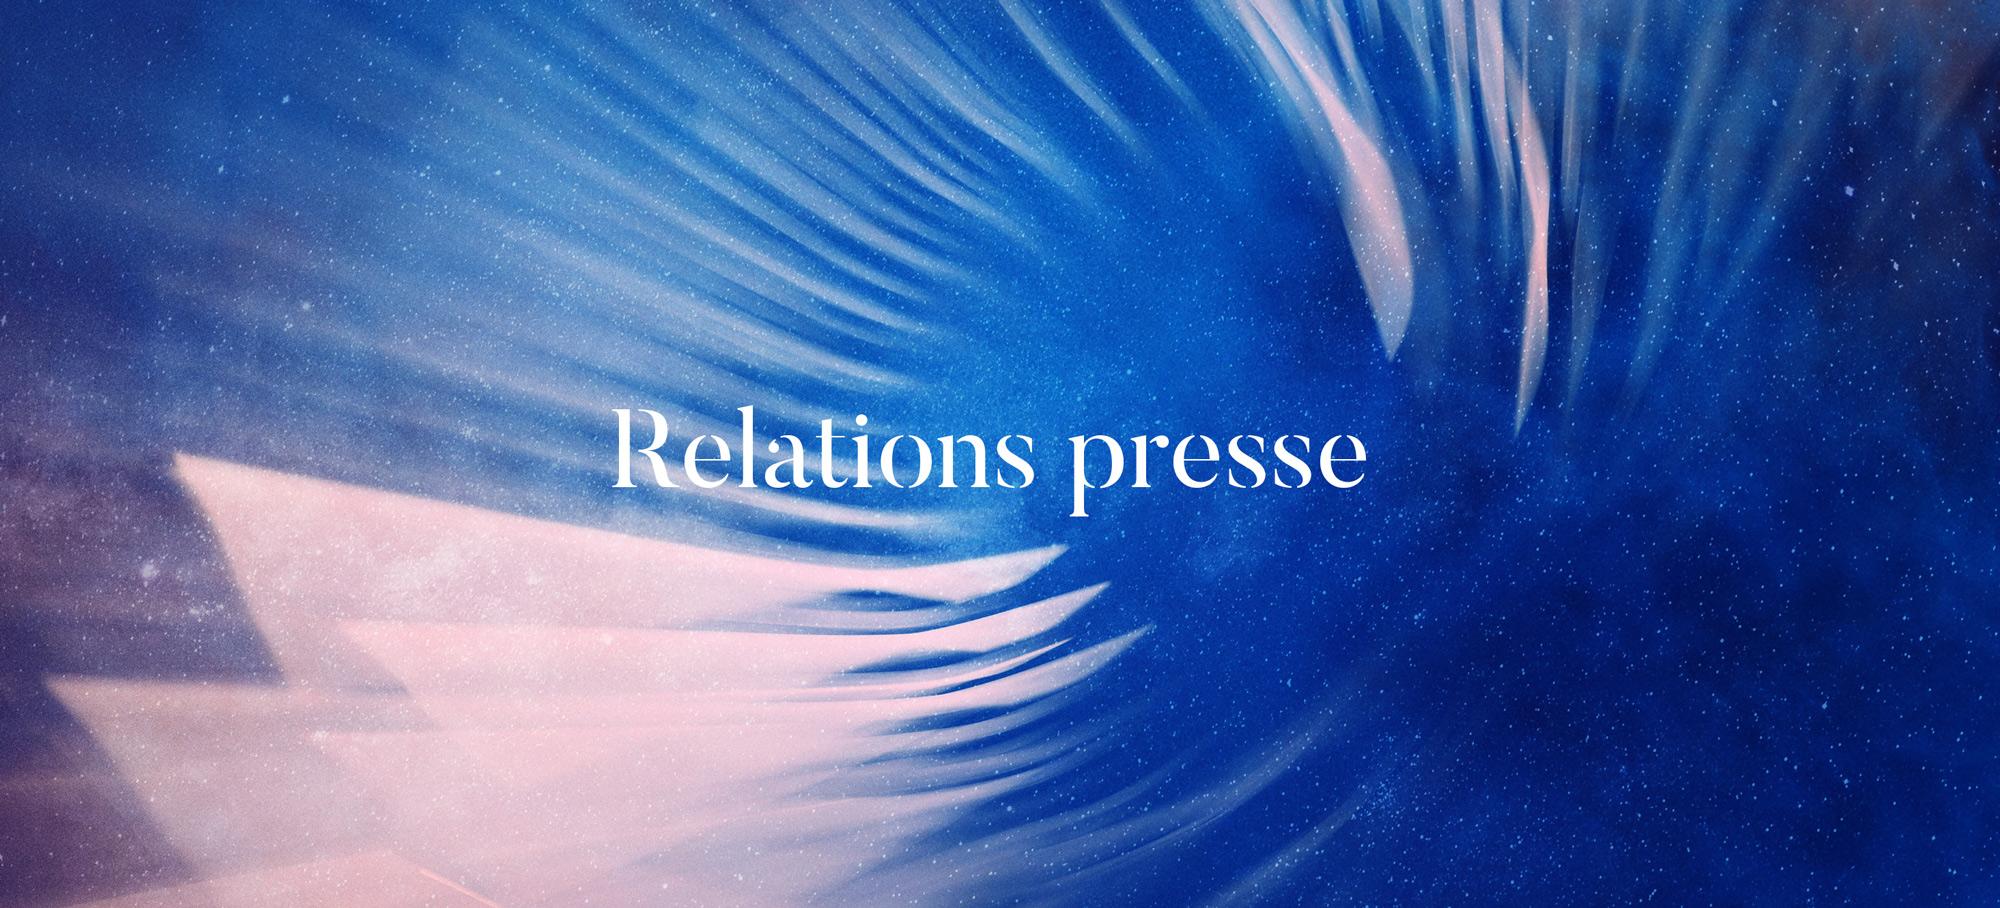 relations-presse--agence-ysee-valentine-franssen